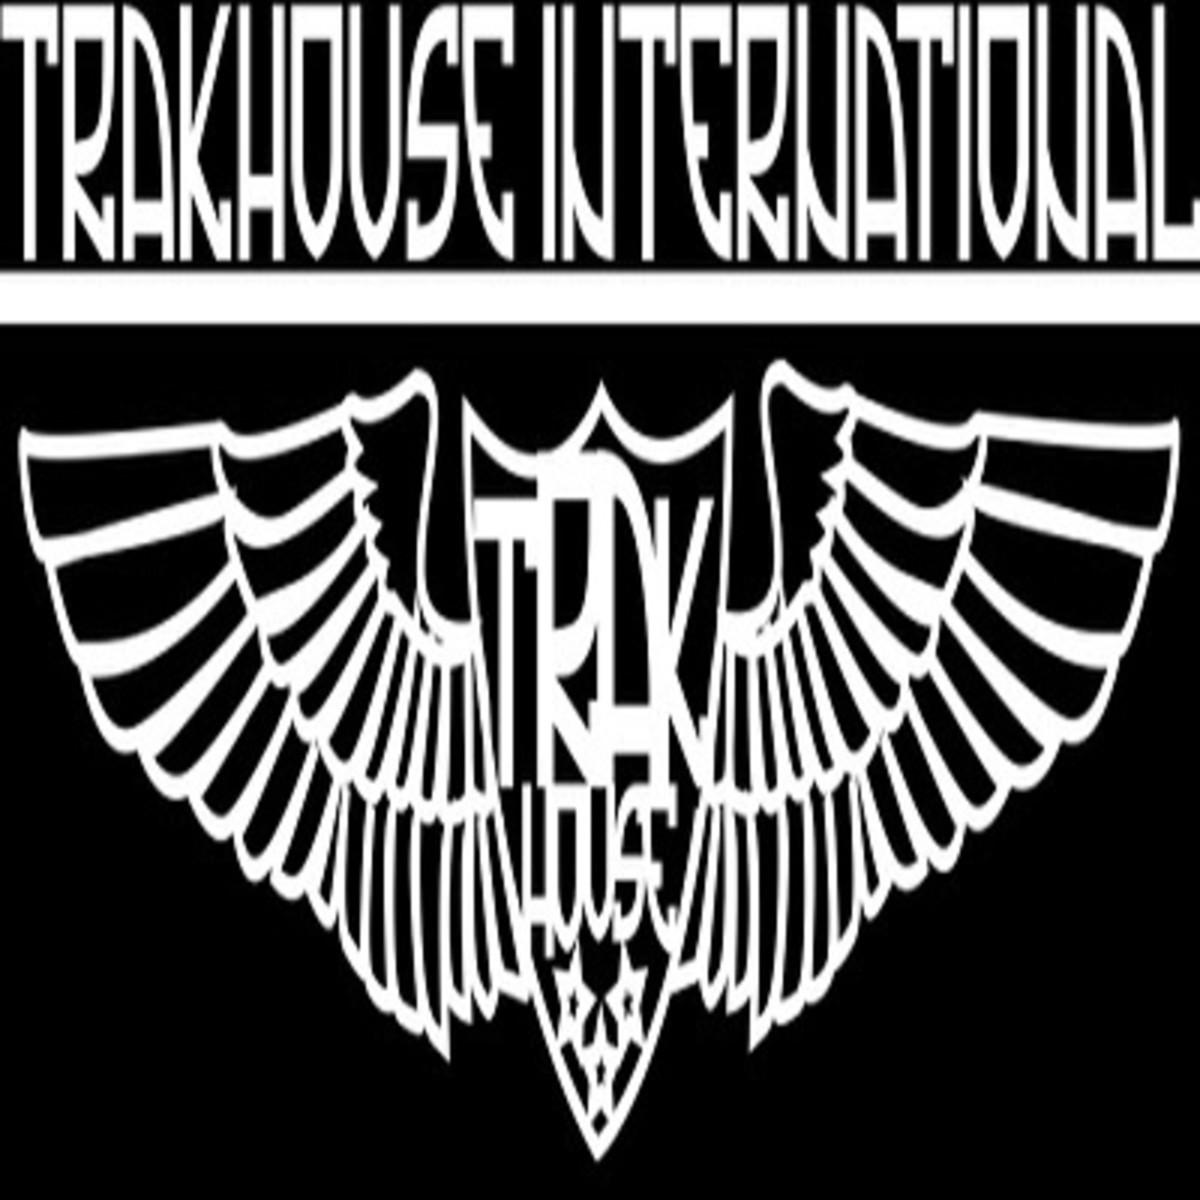 tokiwright-trakhouse.jpg